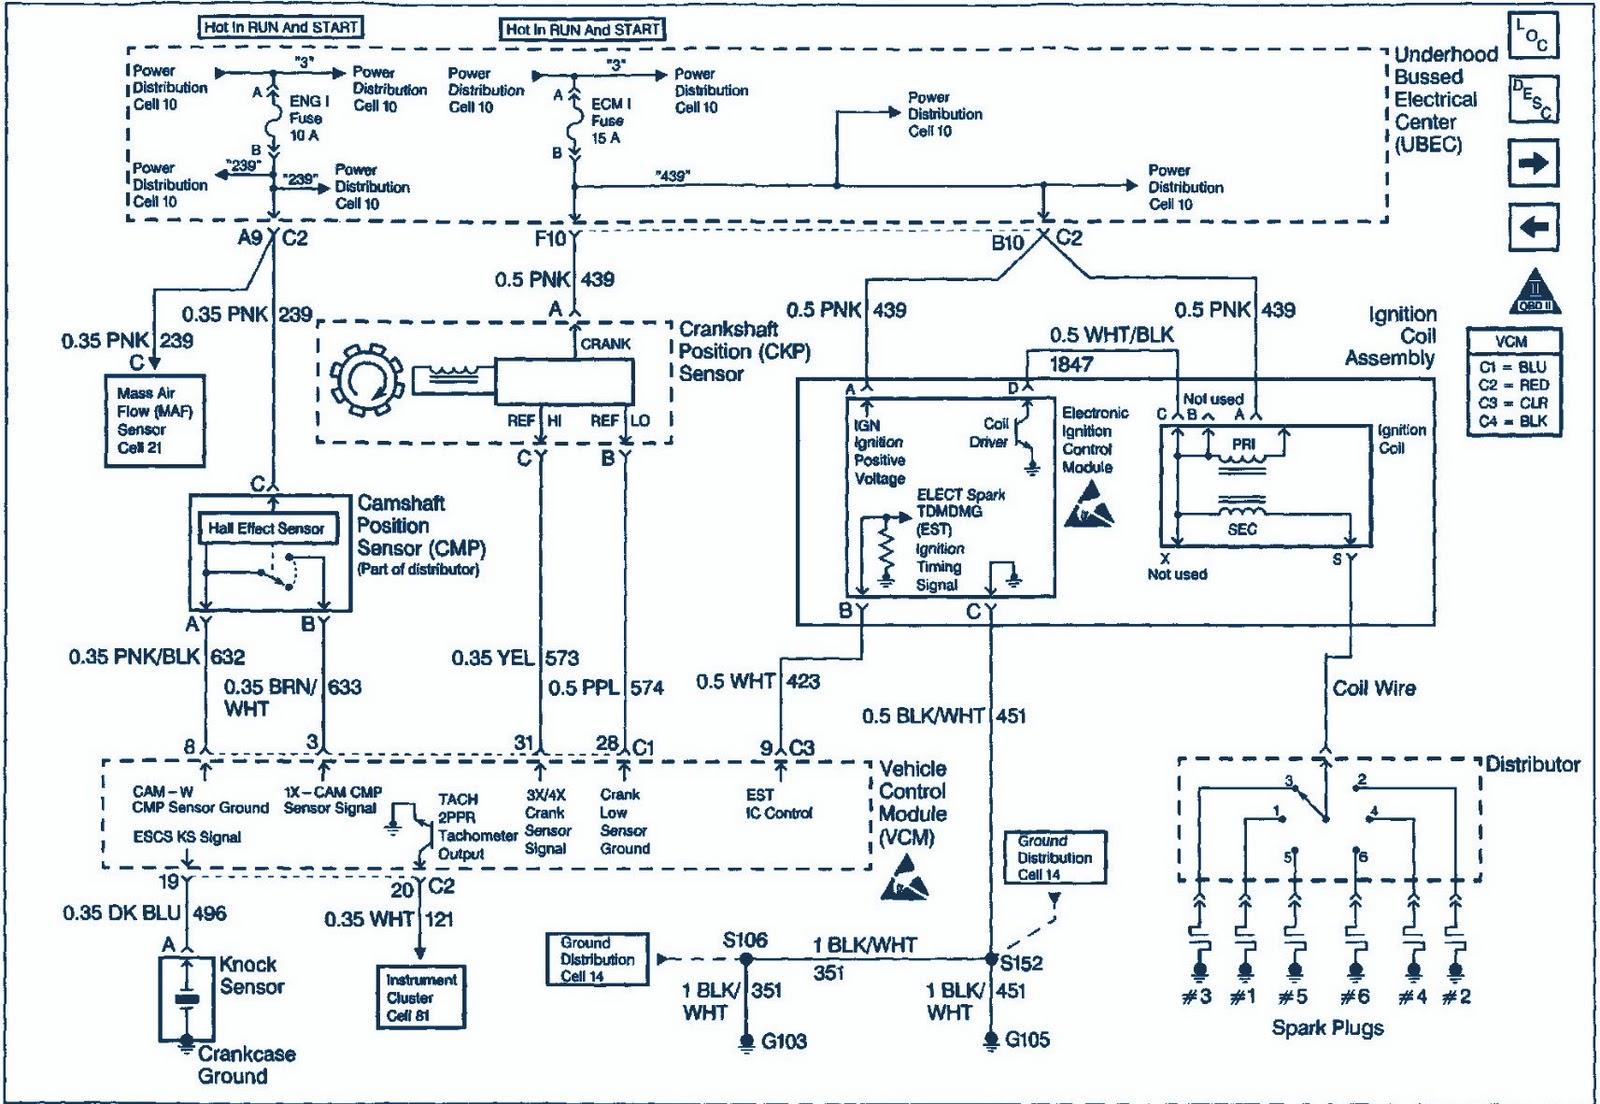 Wiring Schematics For 1998 Toyota Rav4 Smart Diagrams 1997 Corolla Dome Light Schematic Radio Diagram Somurich Com Interior